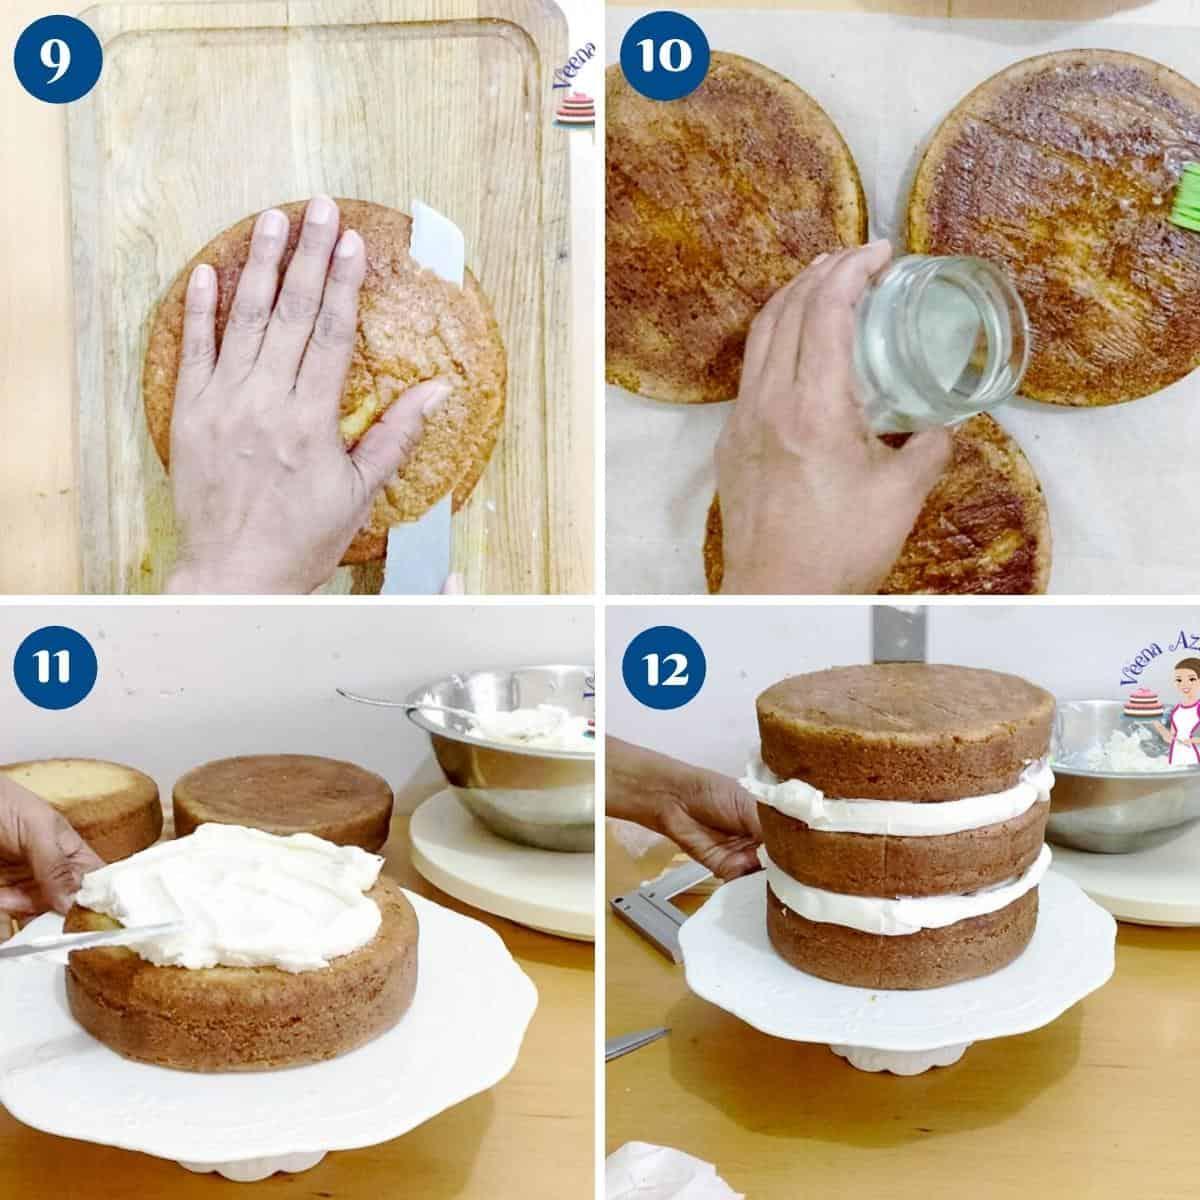 Progress pictures collage stacking vanilla bean paste cake.